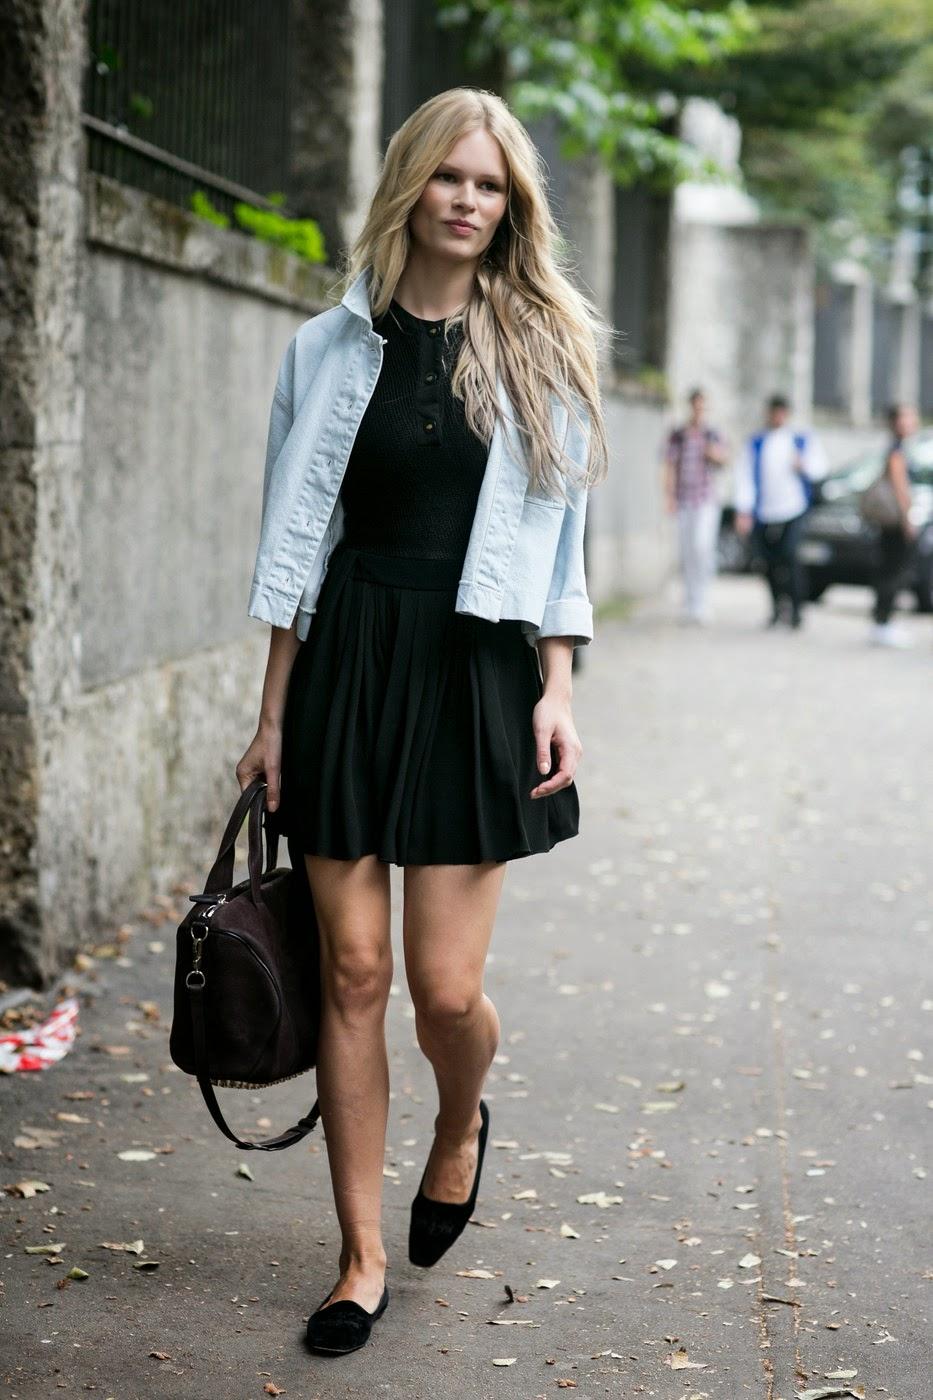 model-style-black-dress-denim-jacket-ballet-flats.jpg